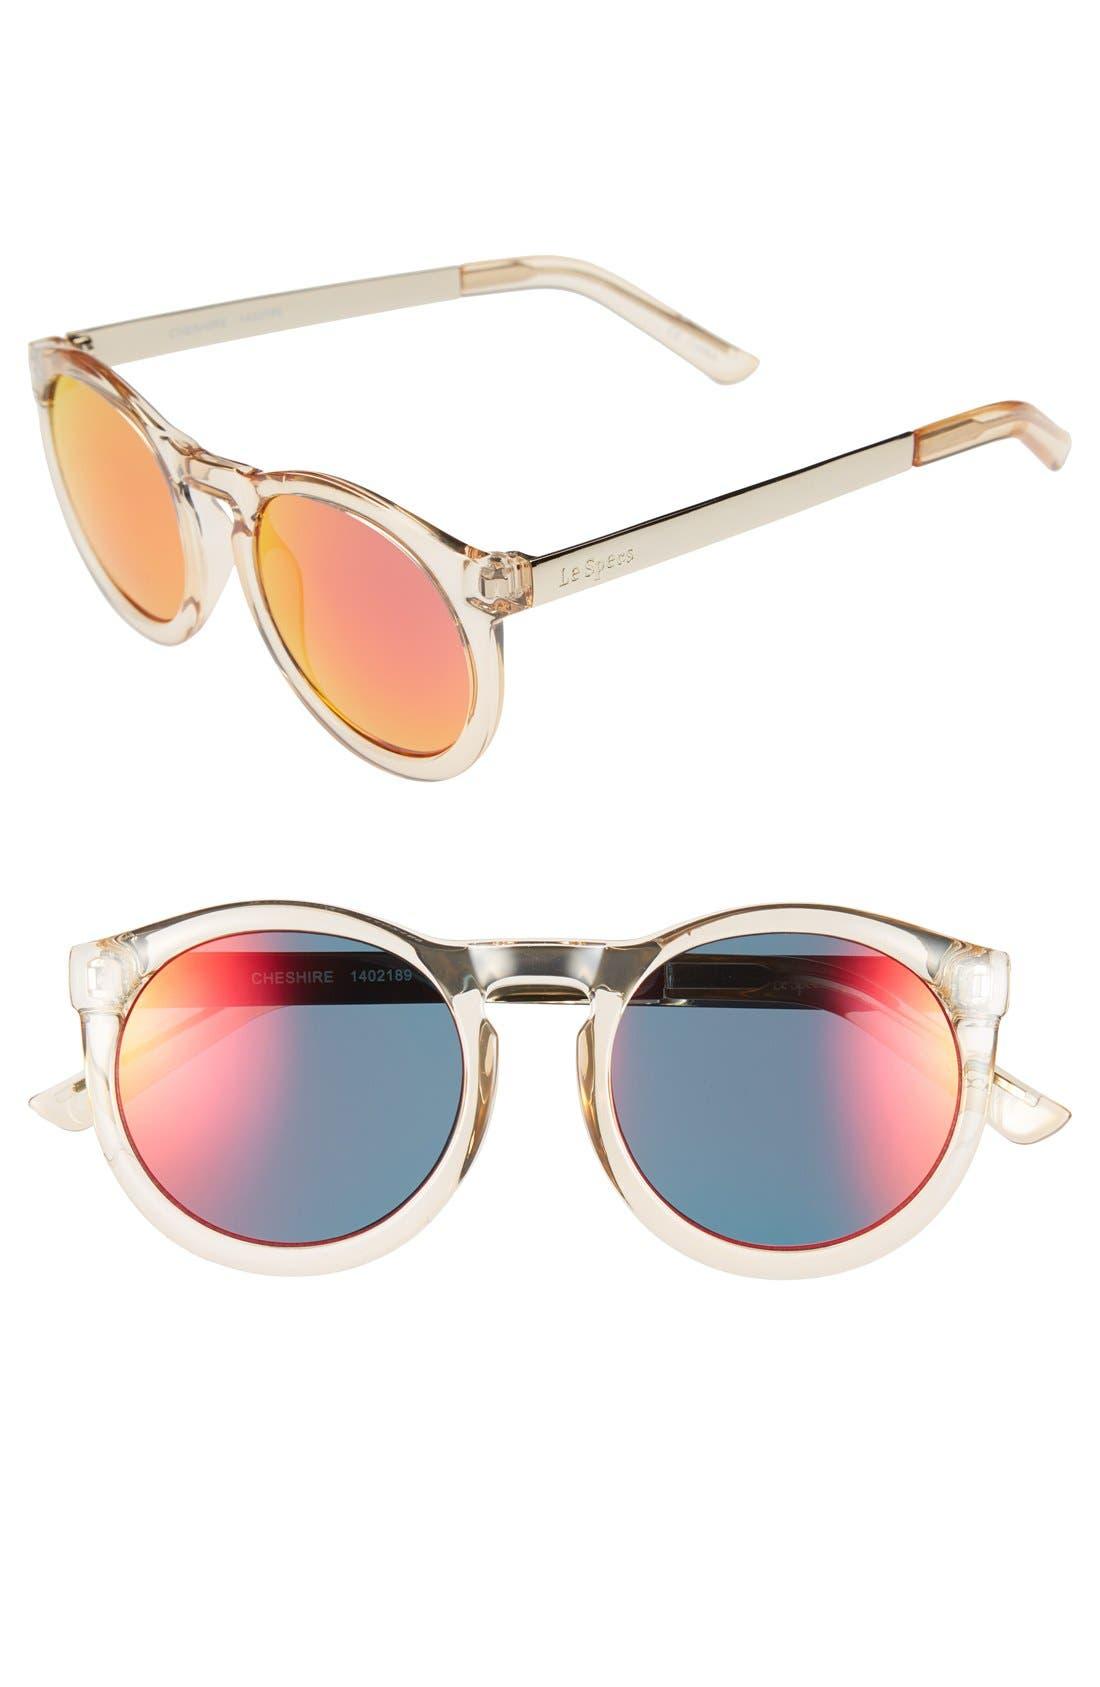 Alternate Image 1 Selected - Le Specs 'Chesire' Sunglasses